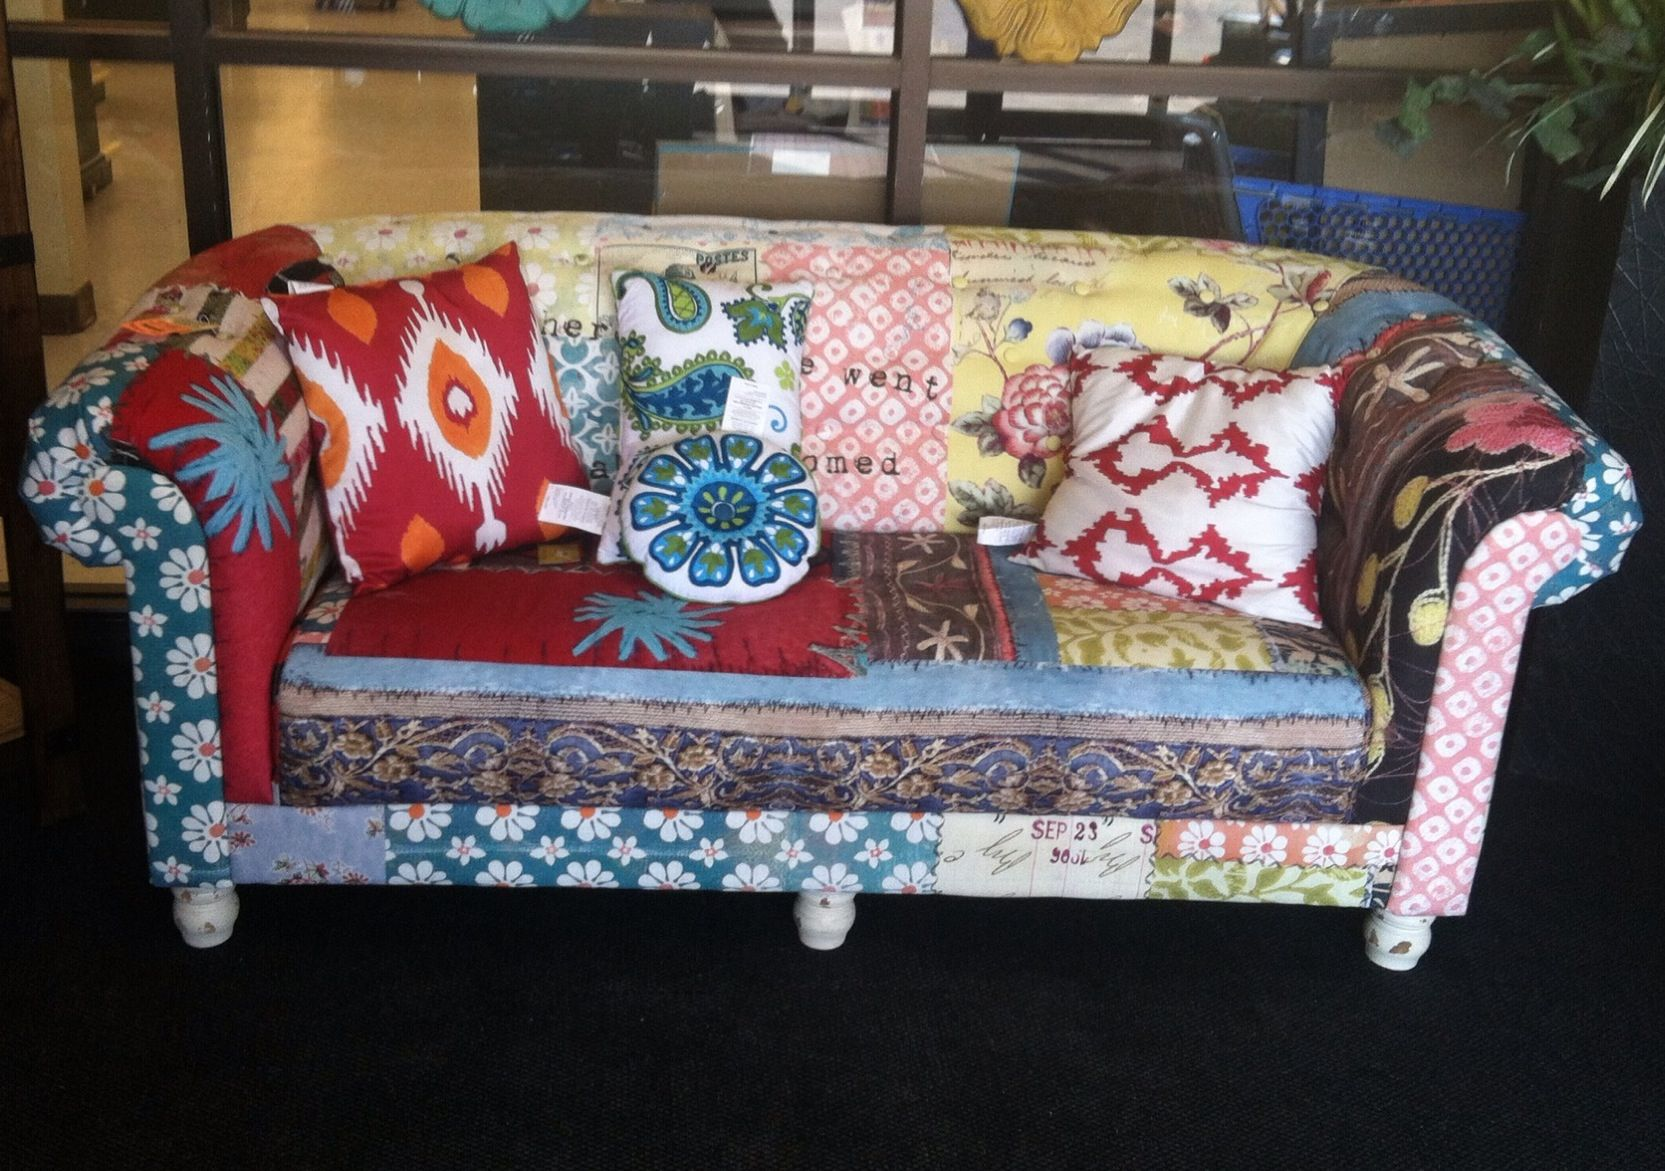 outdoor chair cushion covers australia staples coupon hobby lobby patchwork sofa. | sofa ideas pinterest lobbies, basements and playrooms